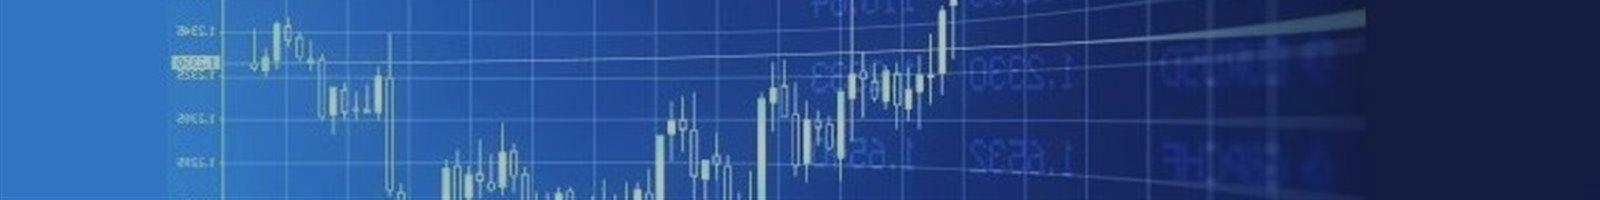 Yen Soars as Sentiment Deteriorates Across Financial Markets